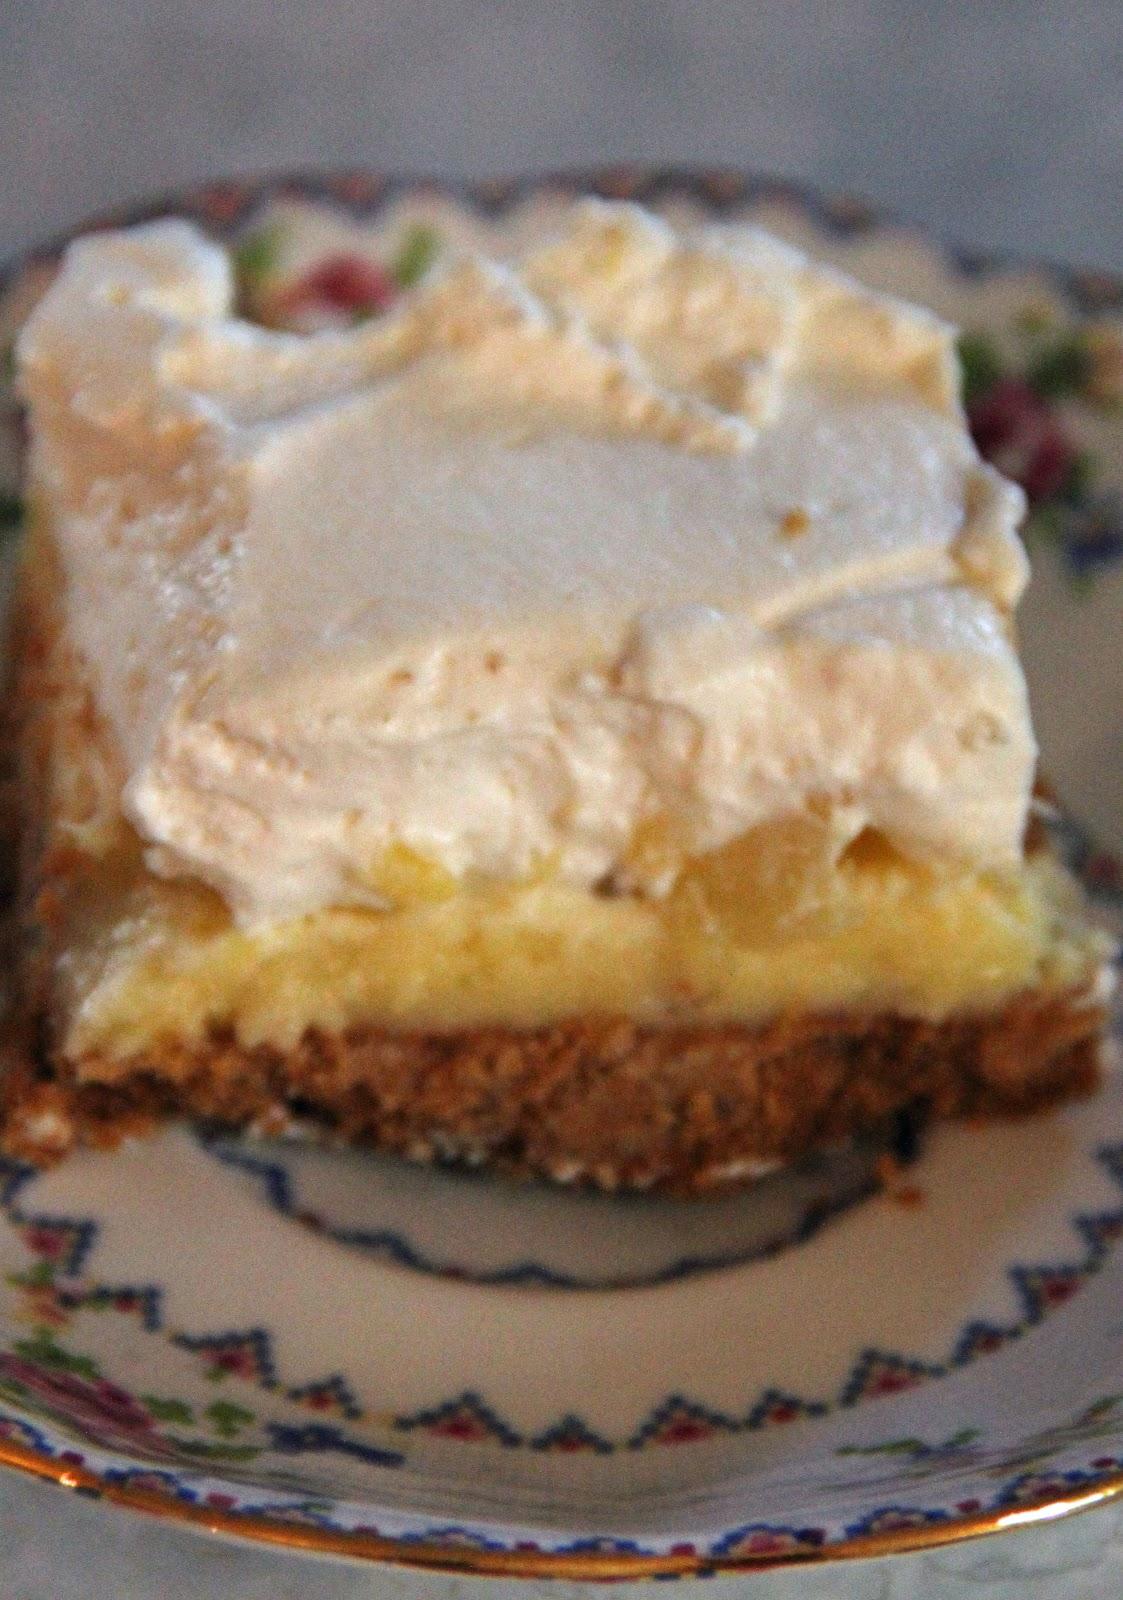 Jo and Sue: Pineapple Dream Dessert